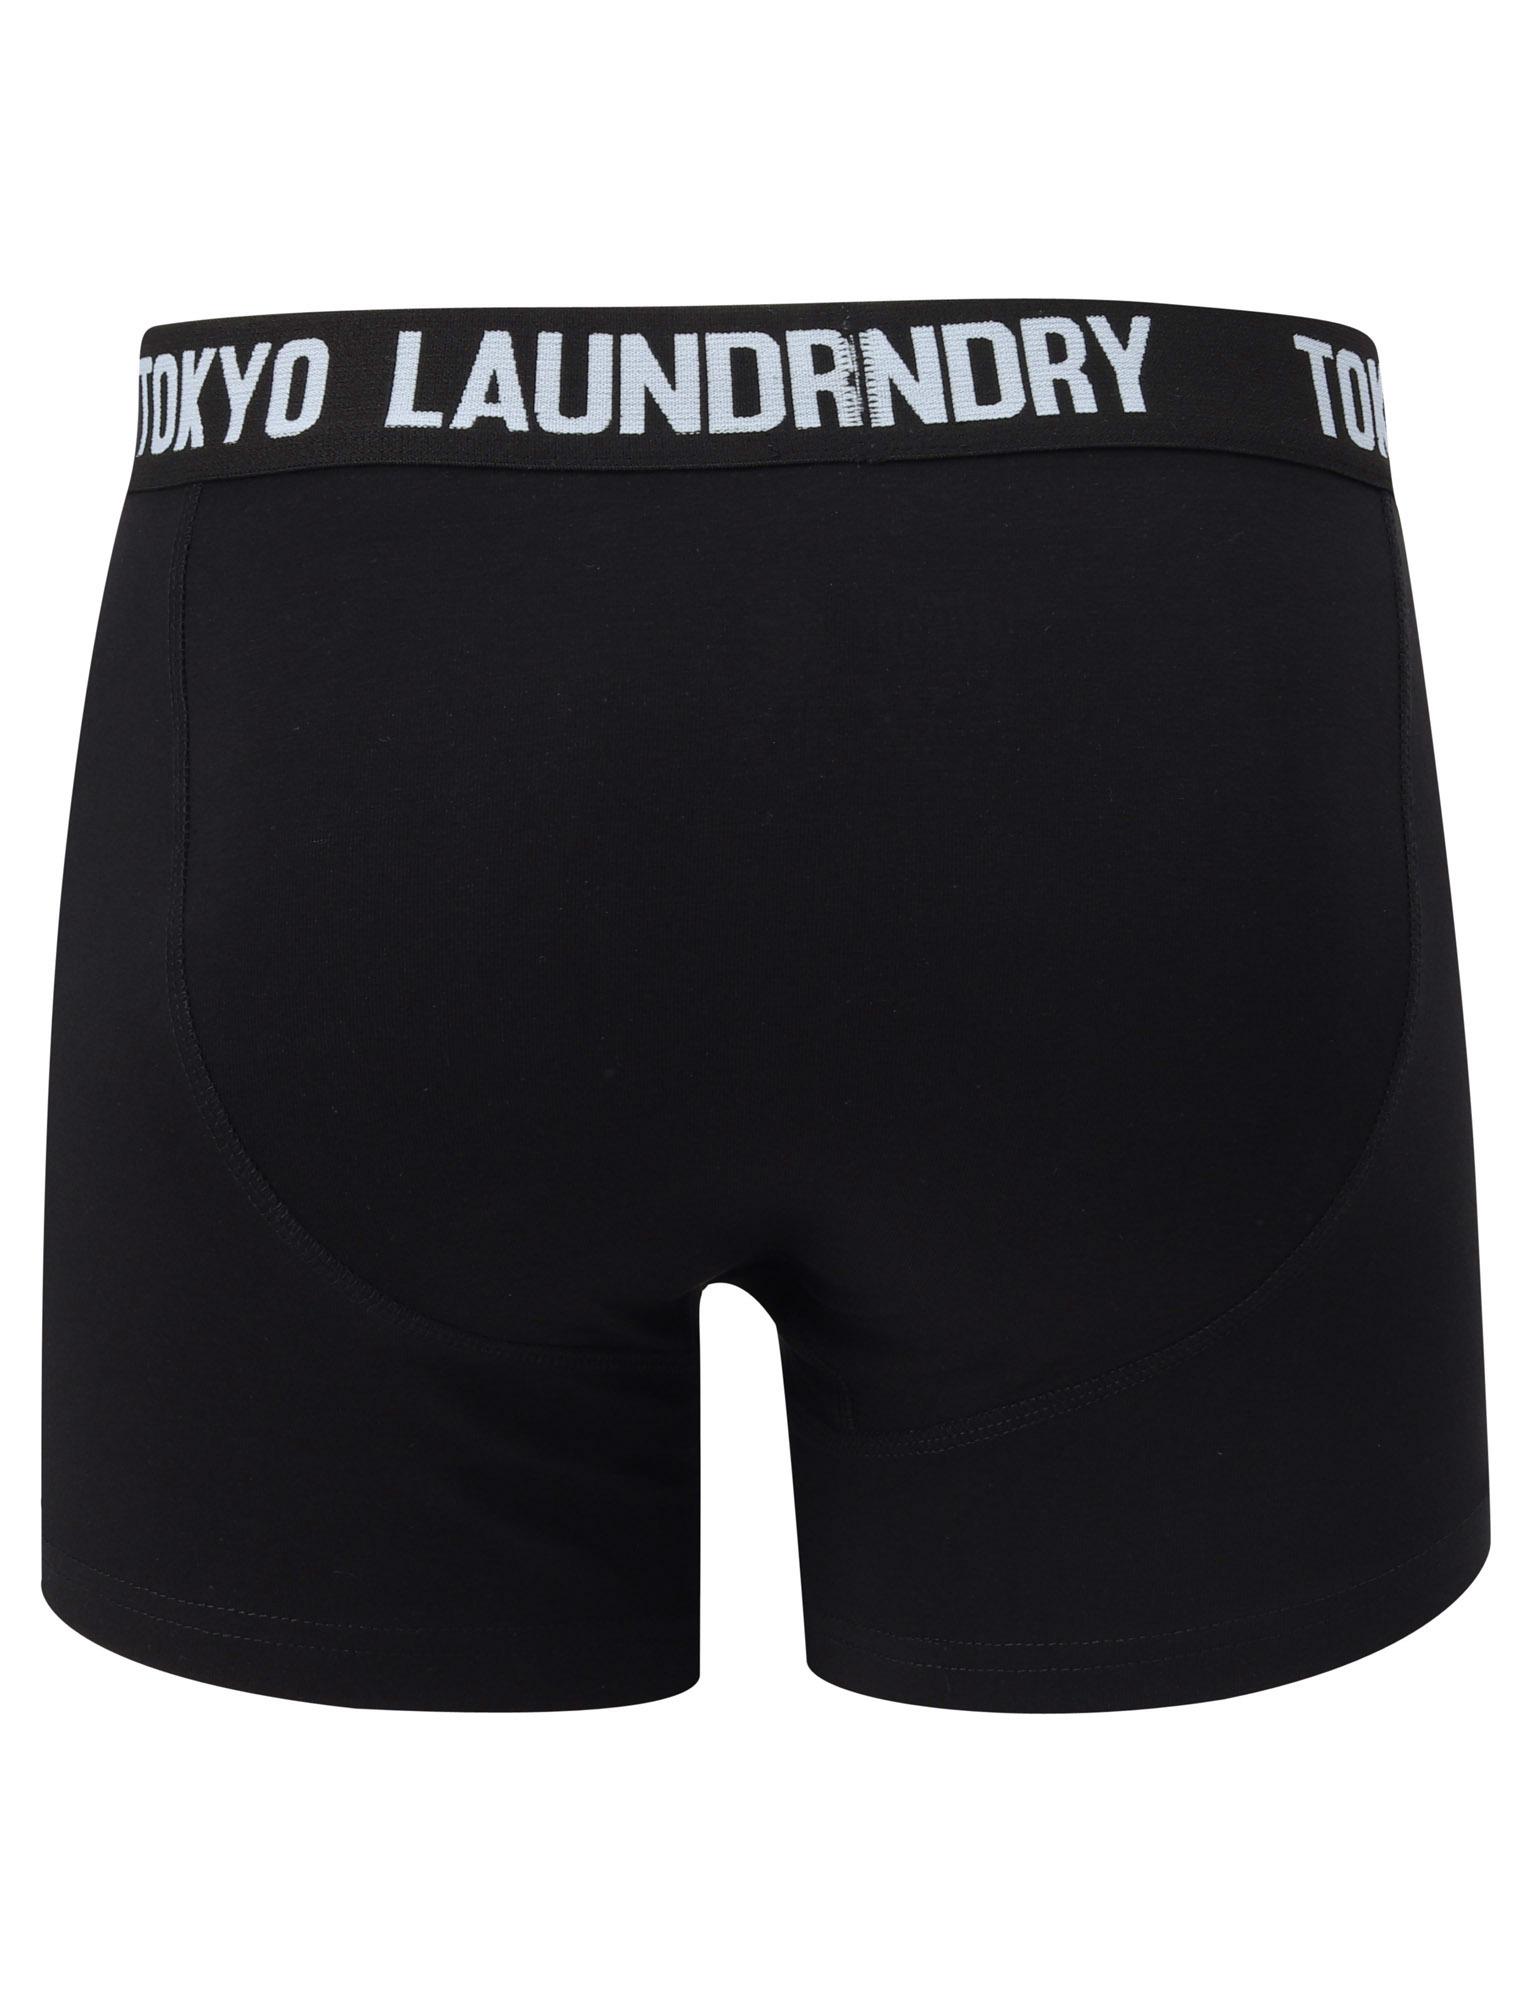 New-Mens-Tokyo-Laundry-2-Pack-Cotton-Rich-Boxer-Shorts-Set-Trunks-Size-S-XXL thumbnail 61